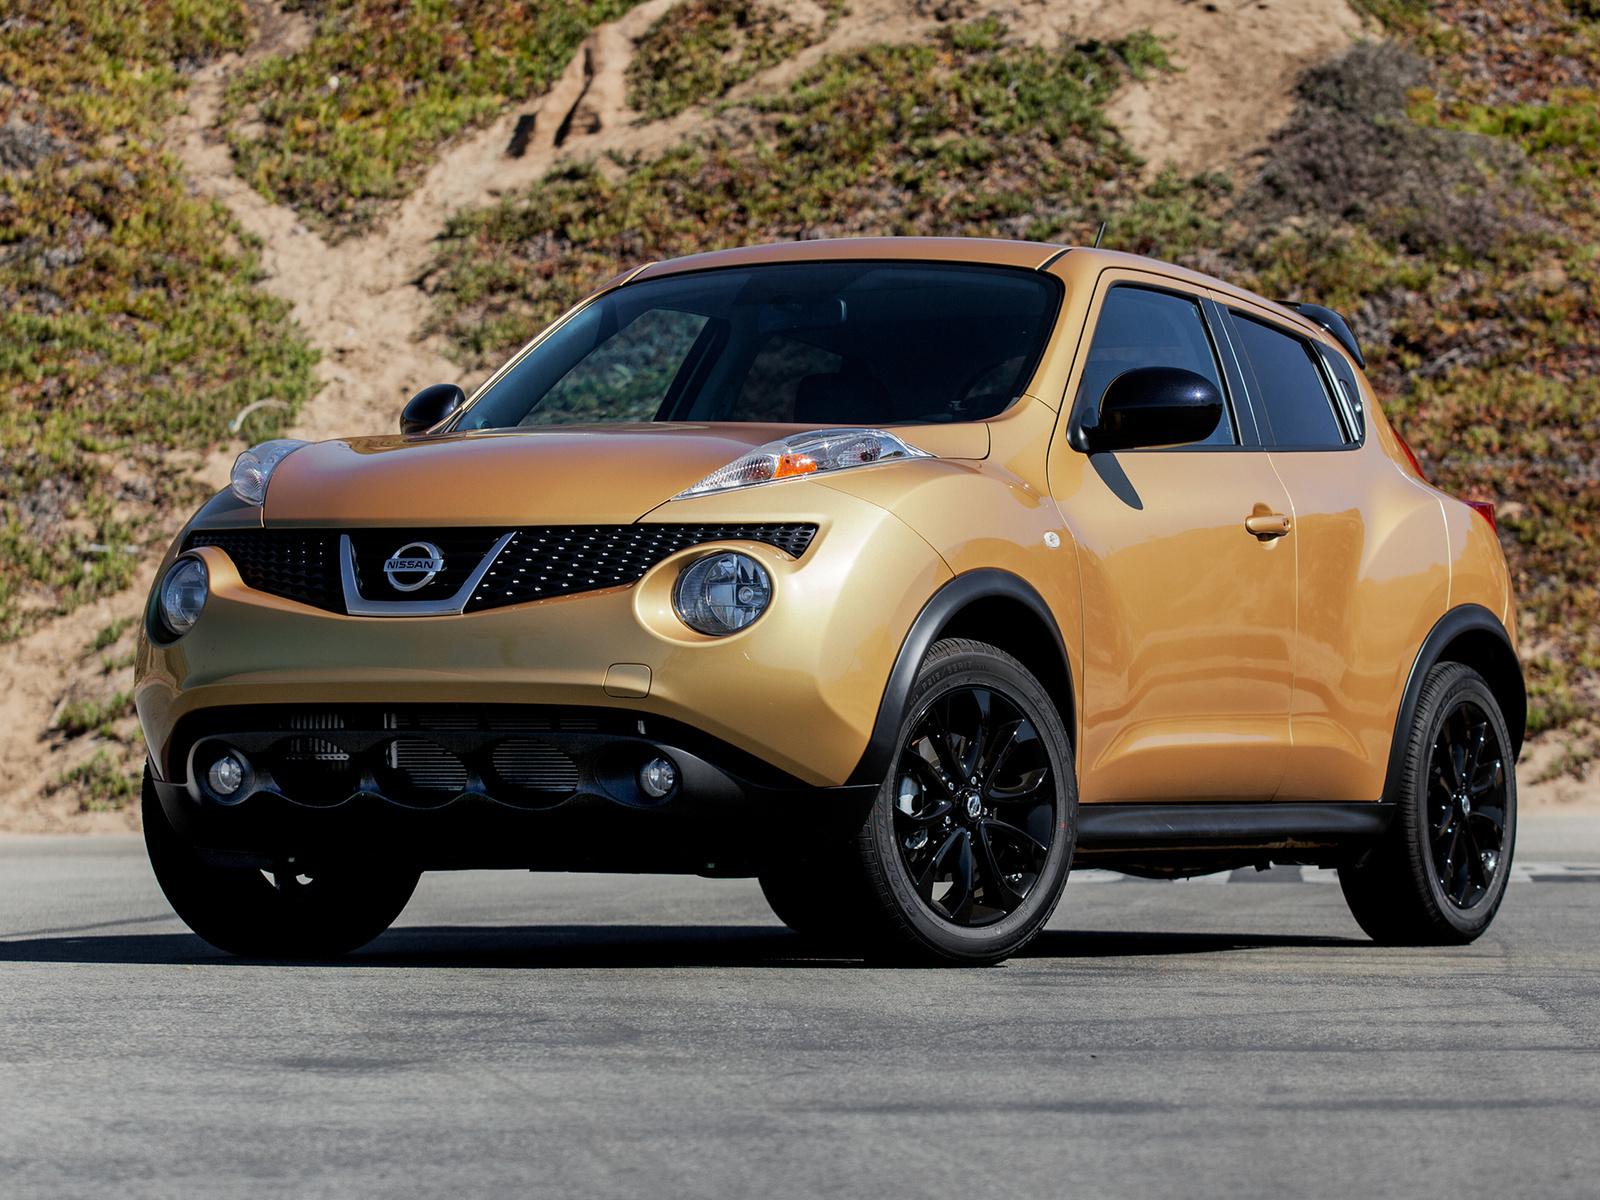 2013 Nissan Juke - Overview - CarGurus